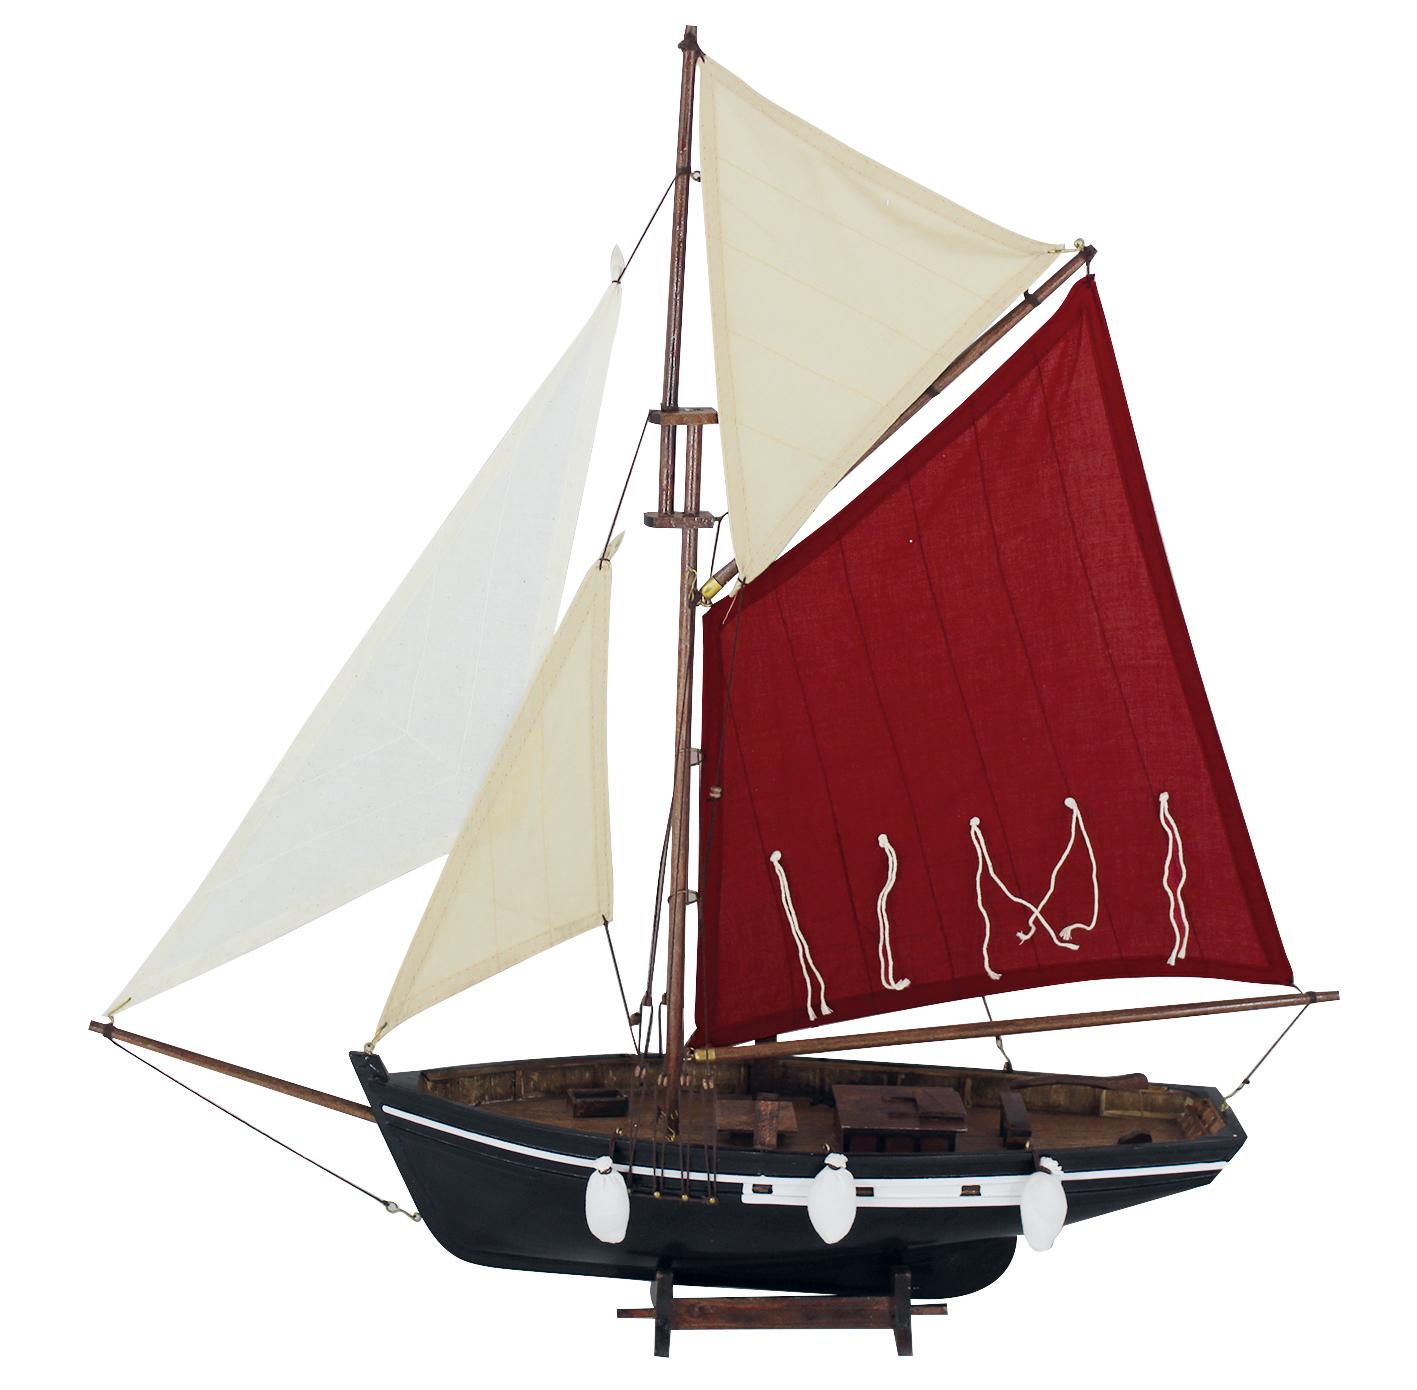 fischerboot rot wei segel fischerboote krabbenkutter deko schiffsmodelle maritim. Black Bedroom Furniture Sets. Home Design Ideas